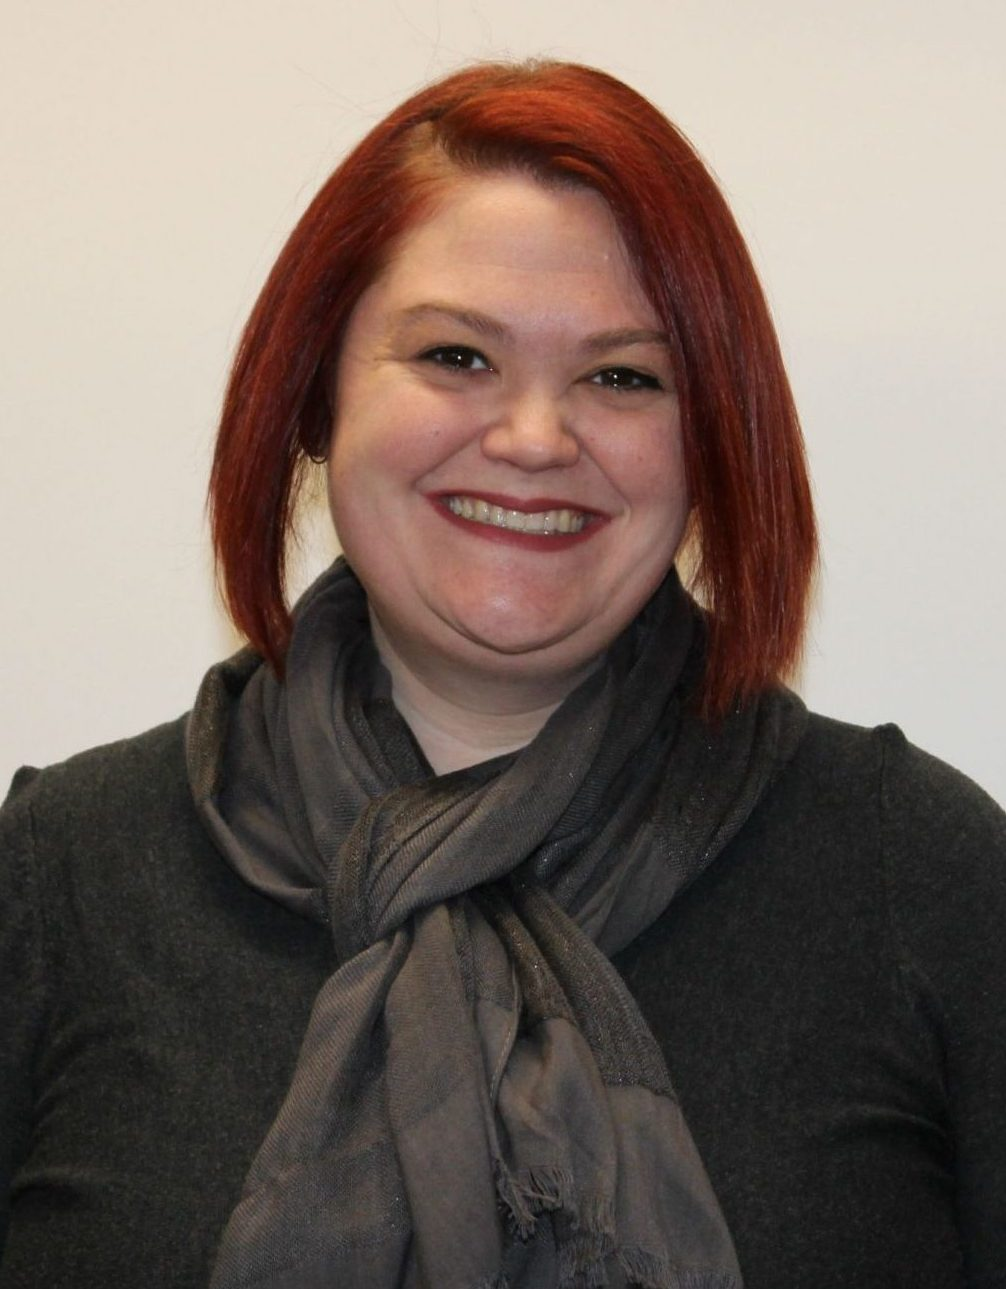 Kristin Garlick, BS, CVPM